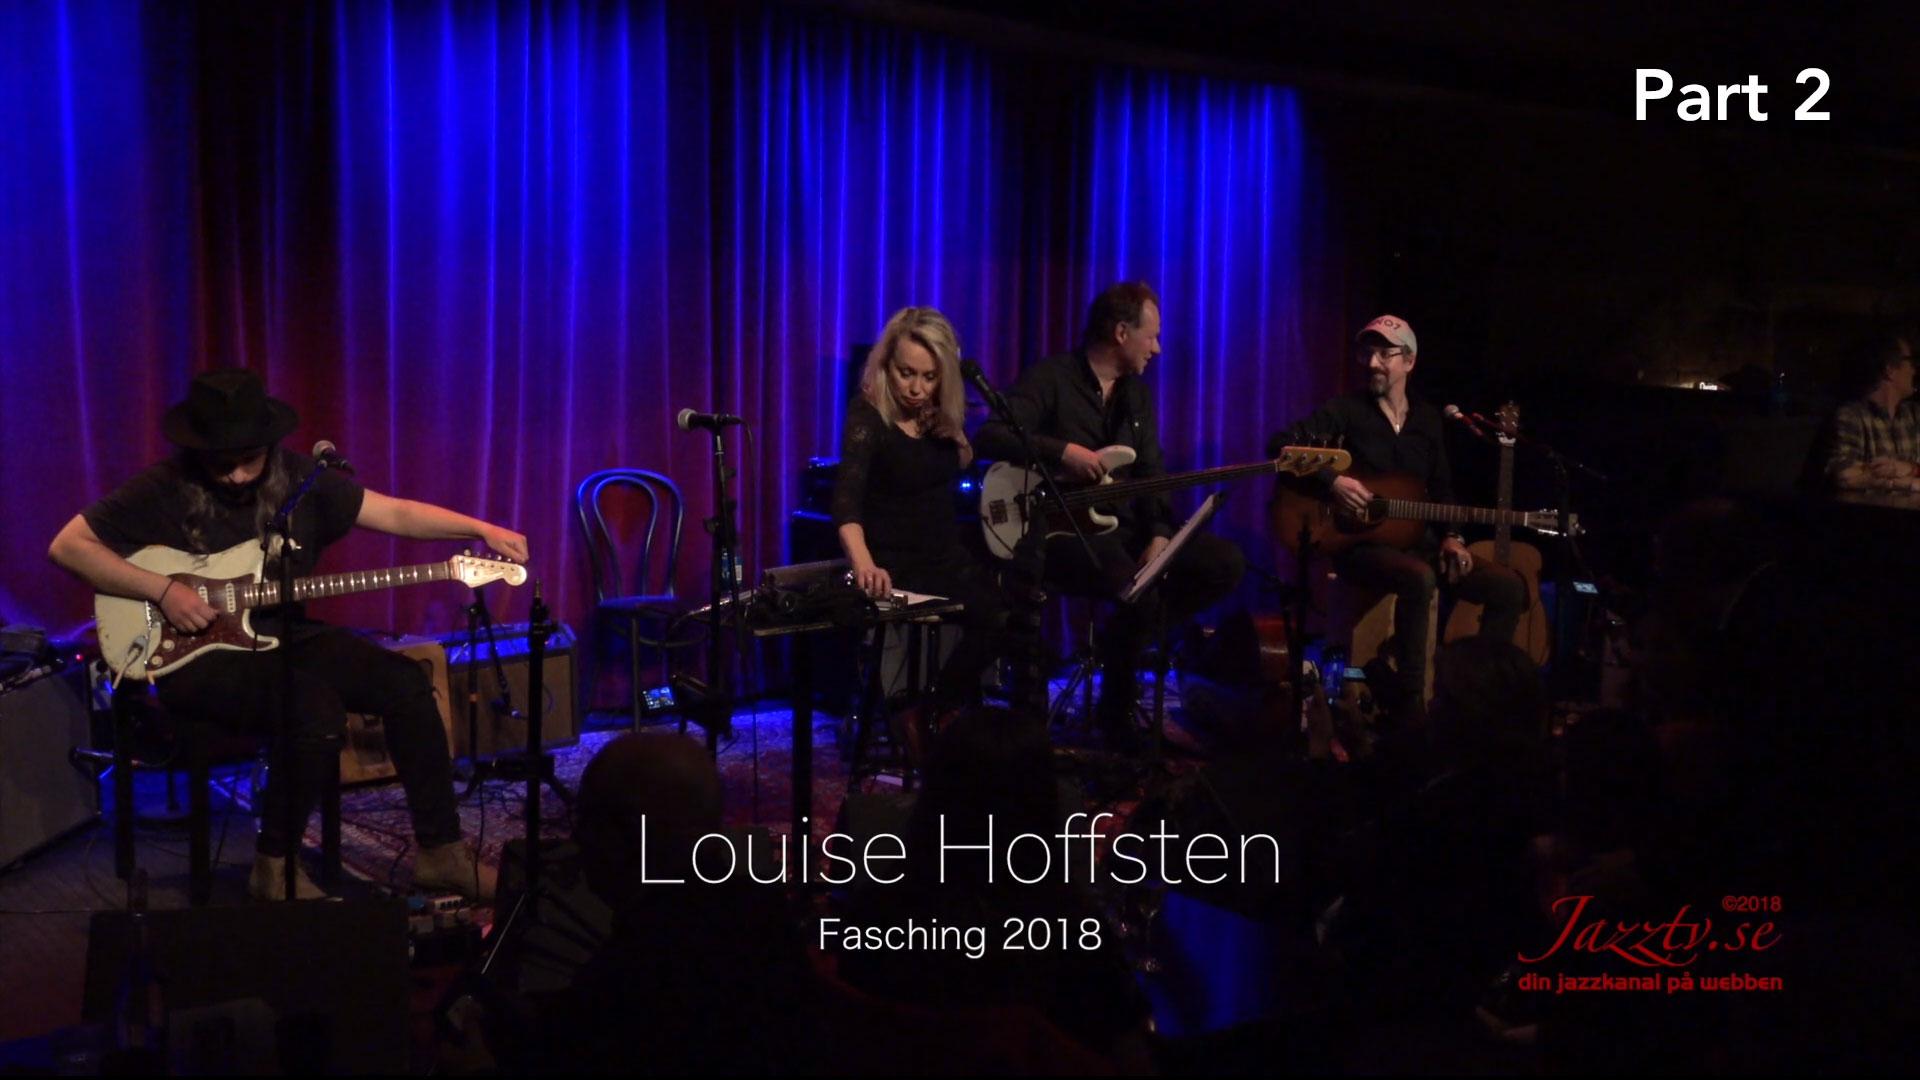 Louise Hoffsten Fasching 2018